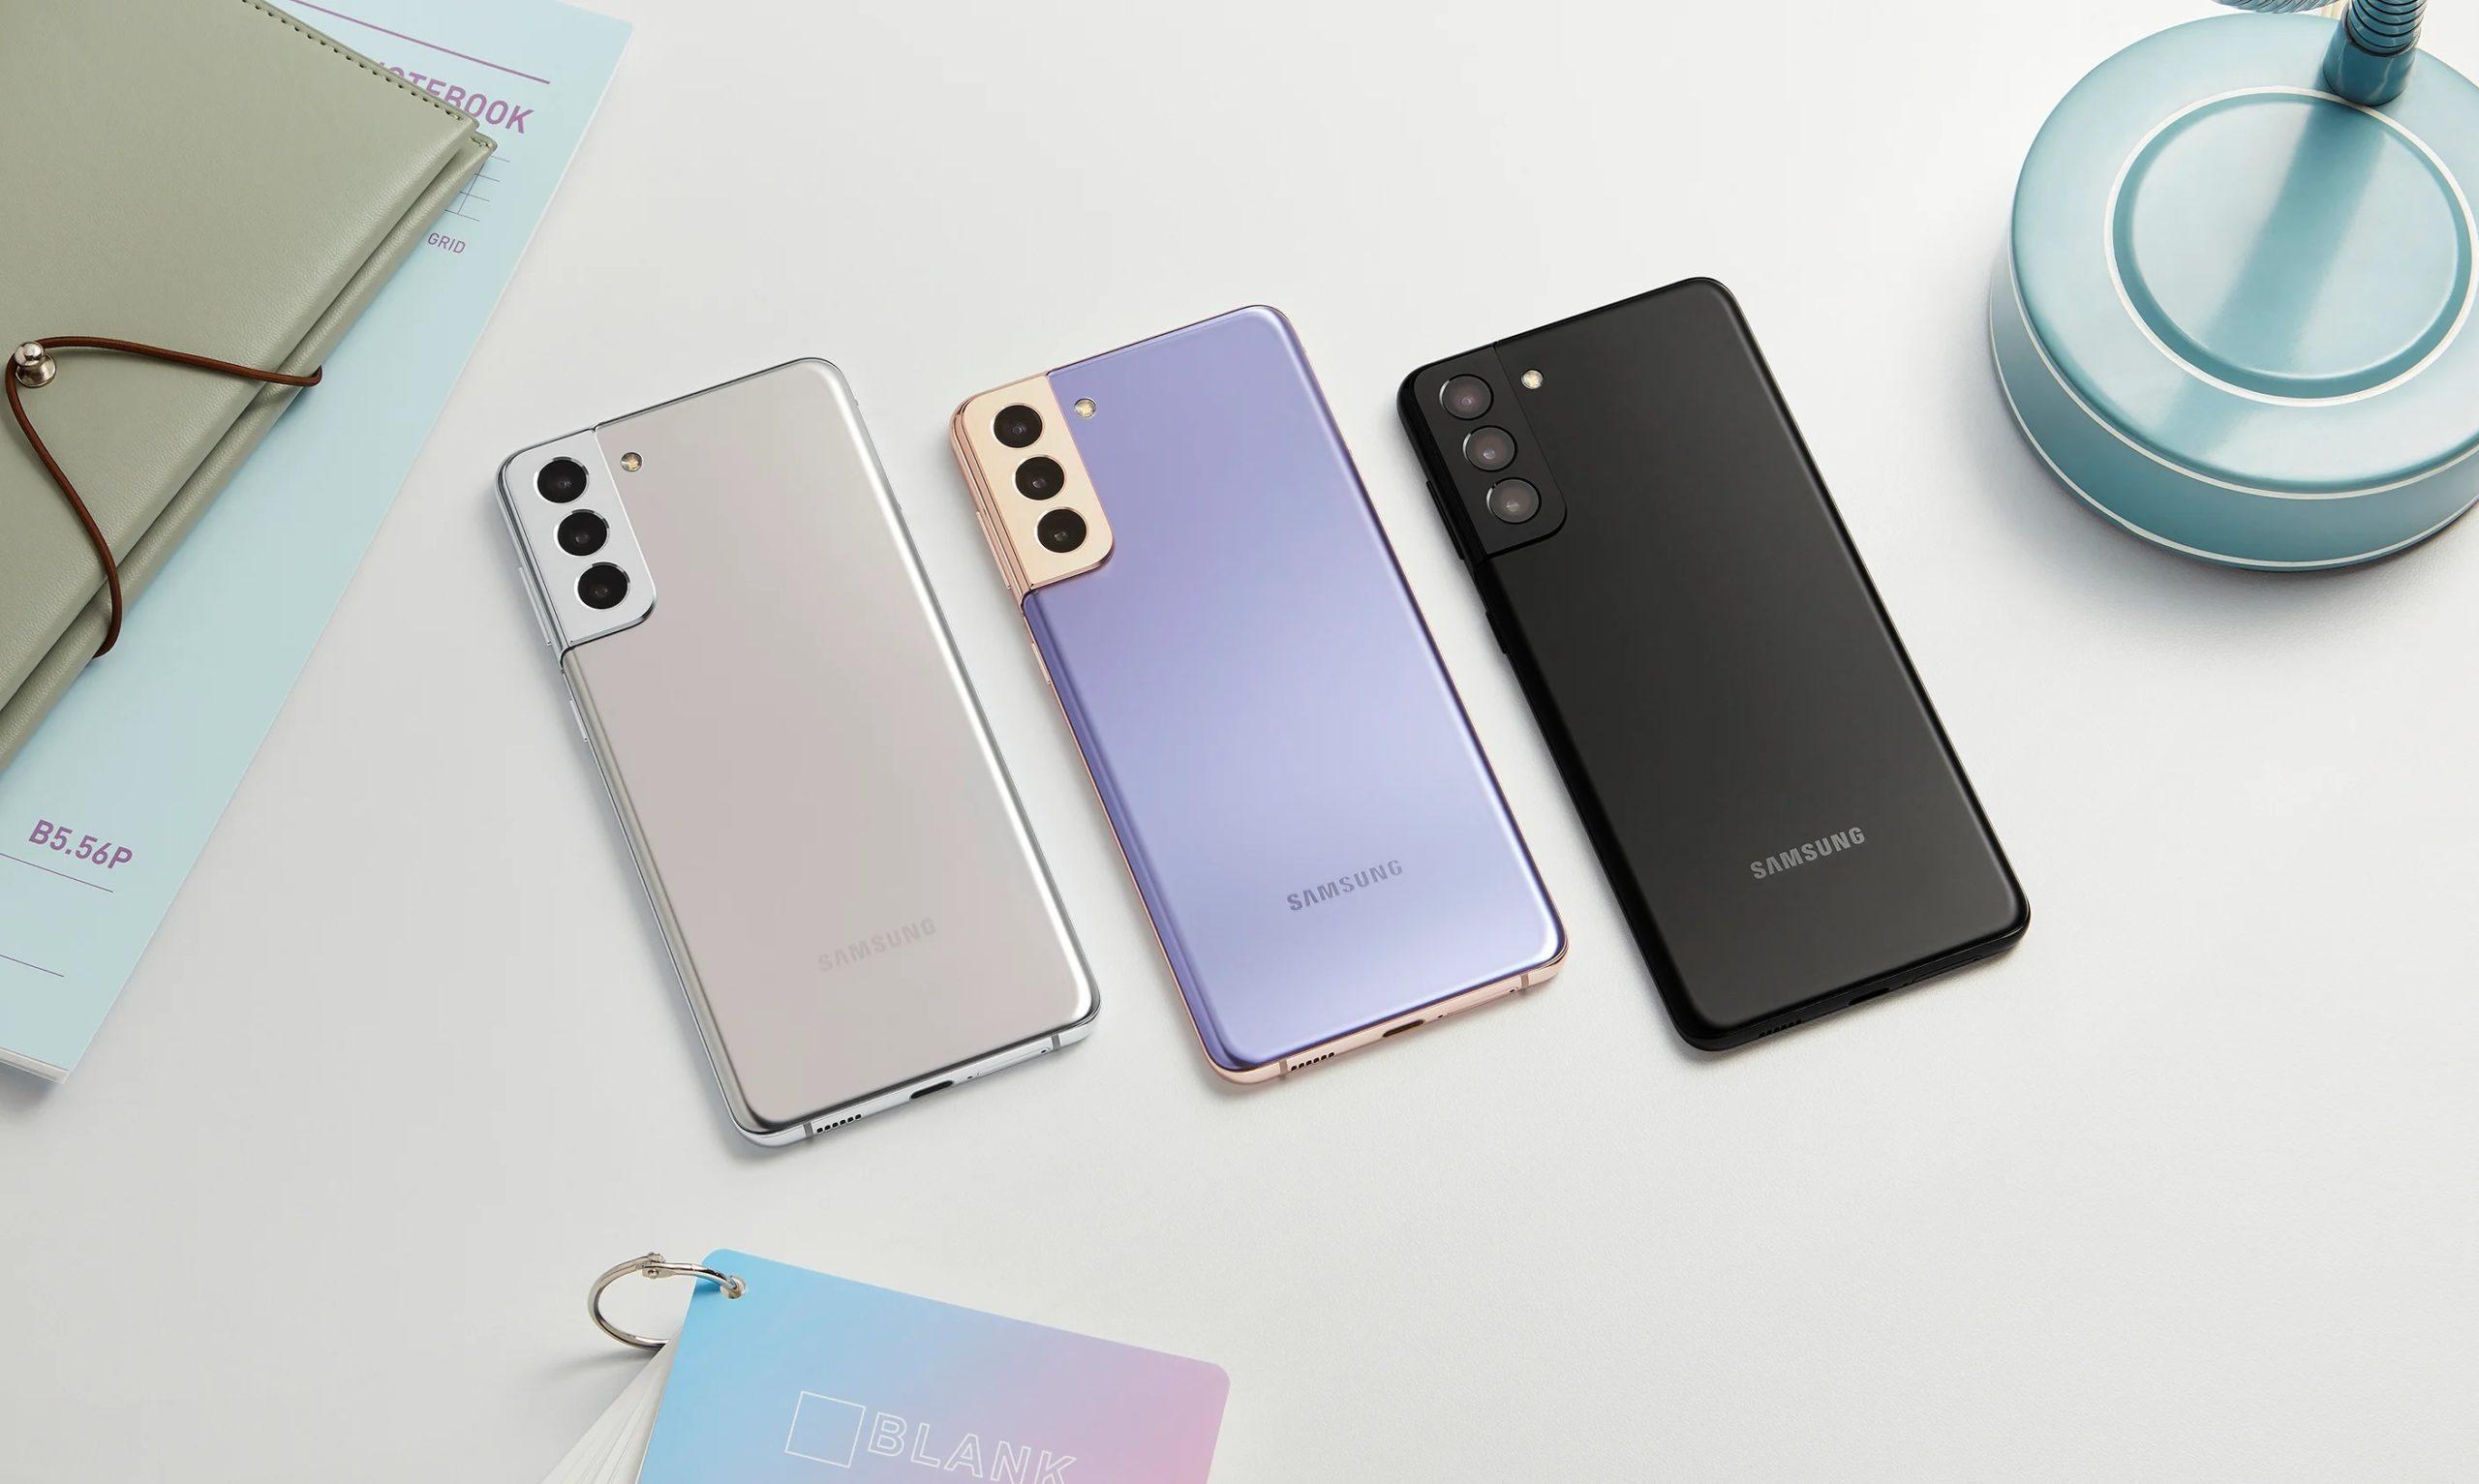 Samsung Galaxy S21+: the best phone